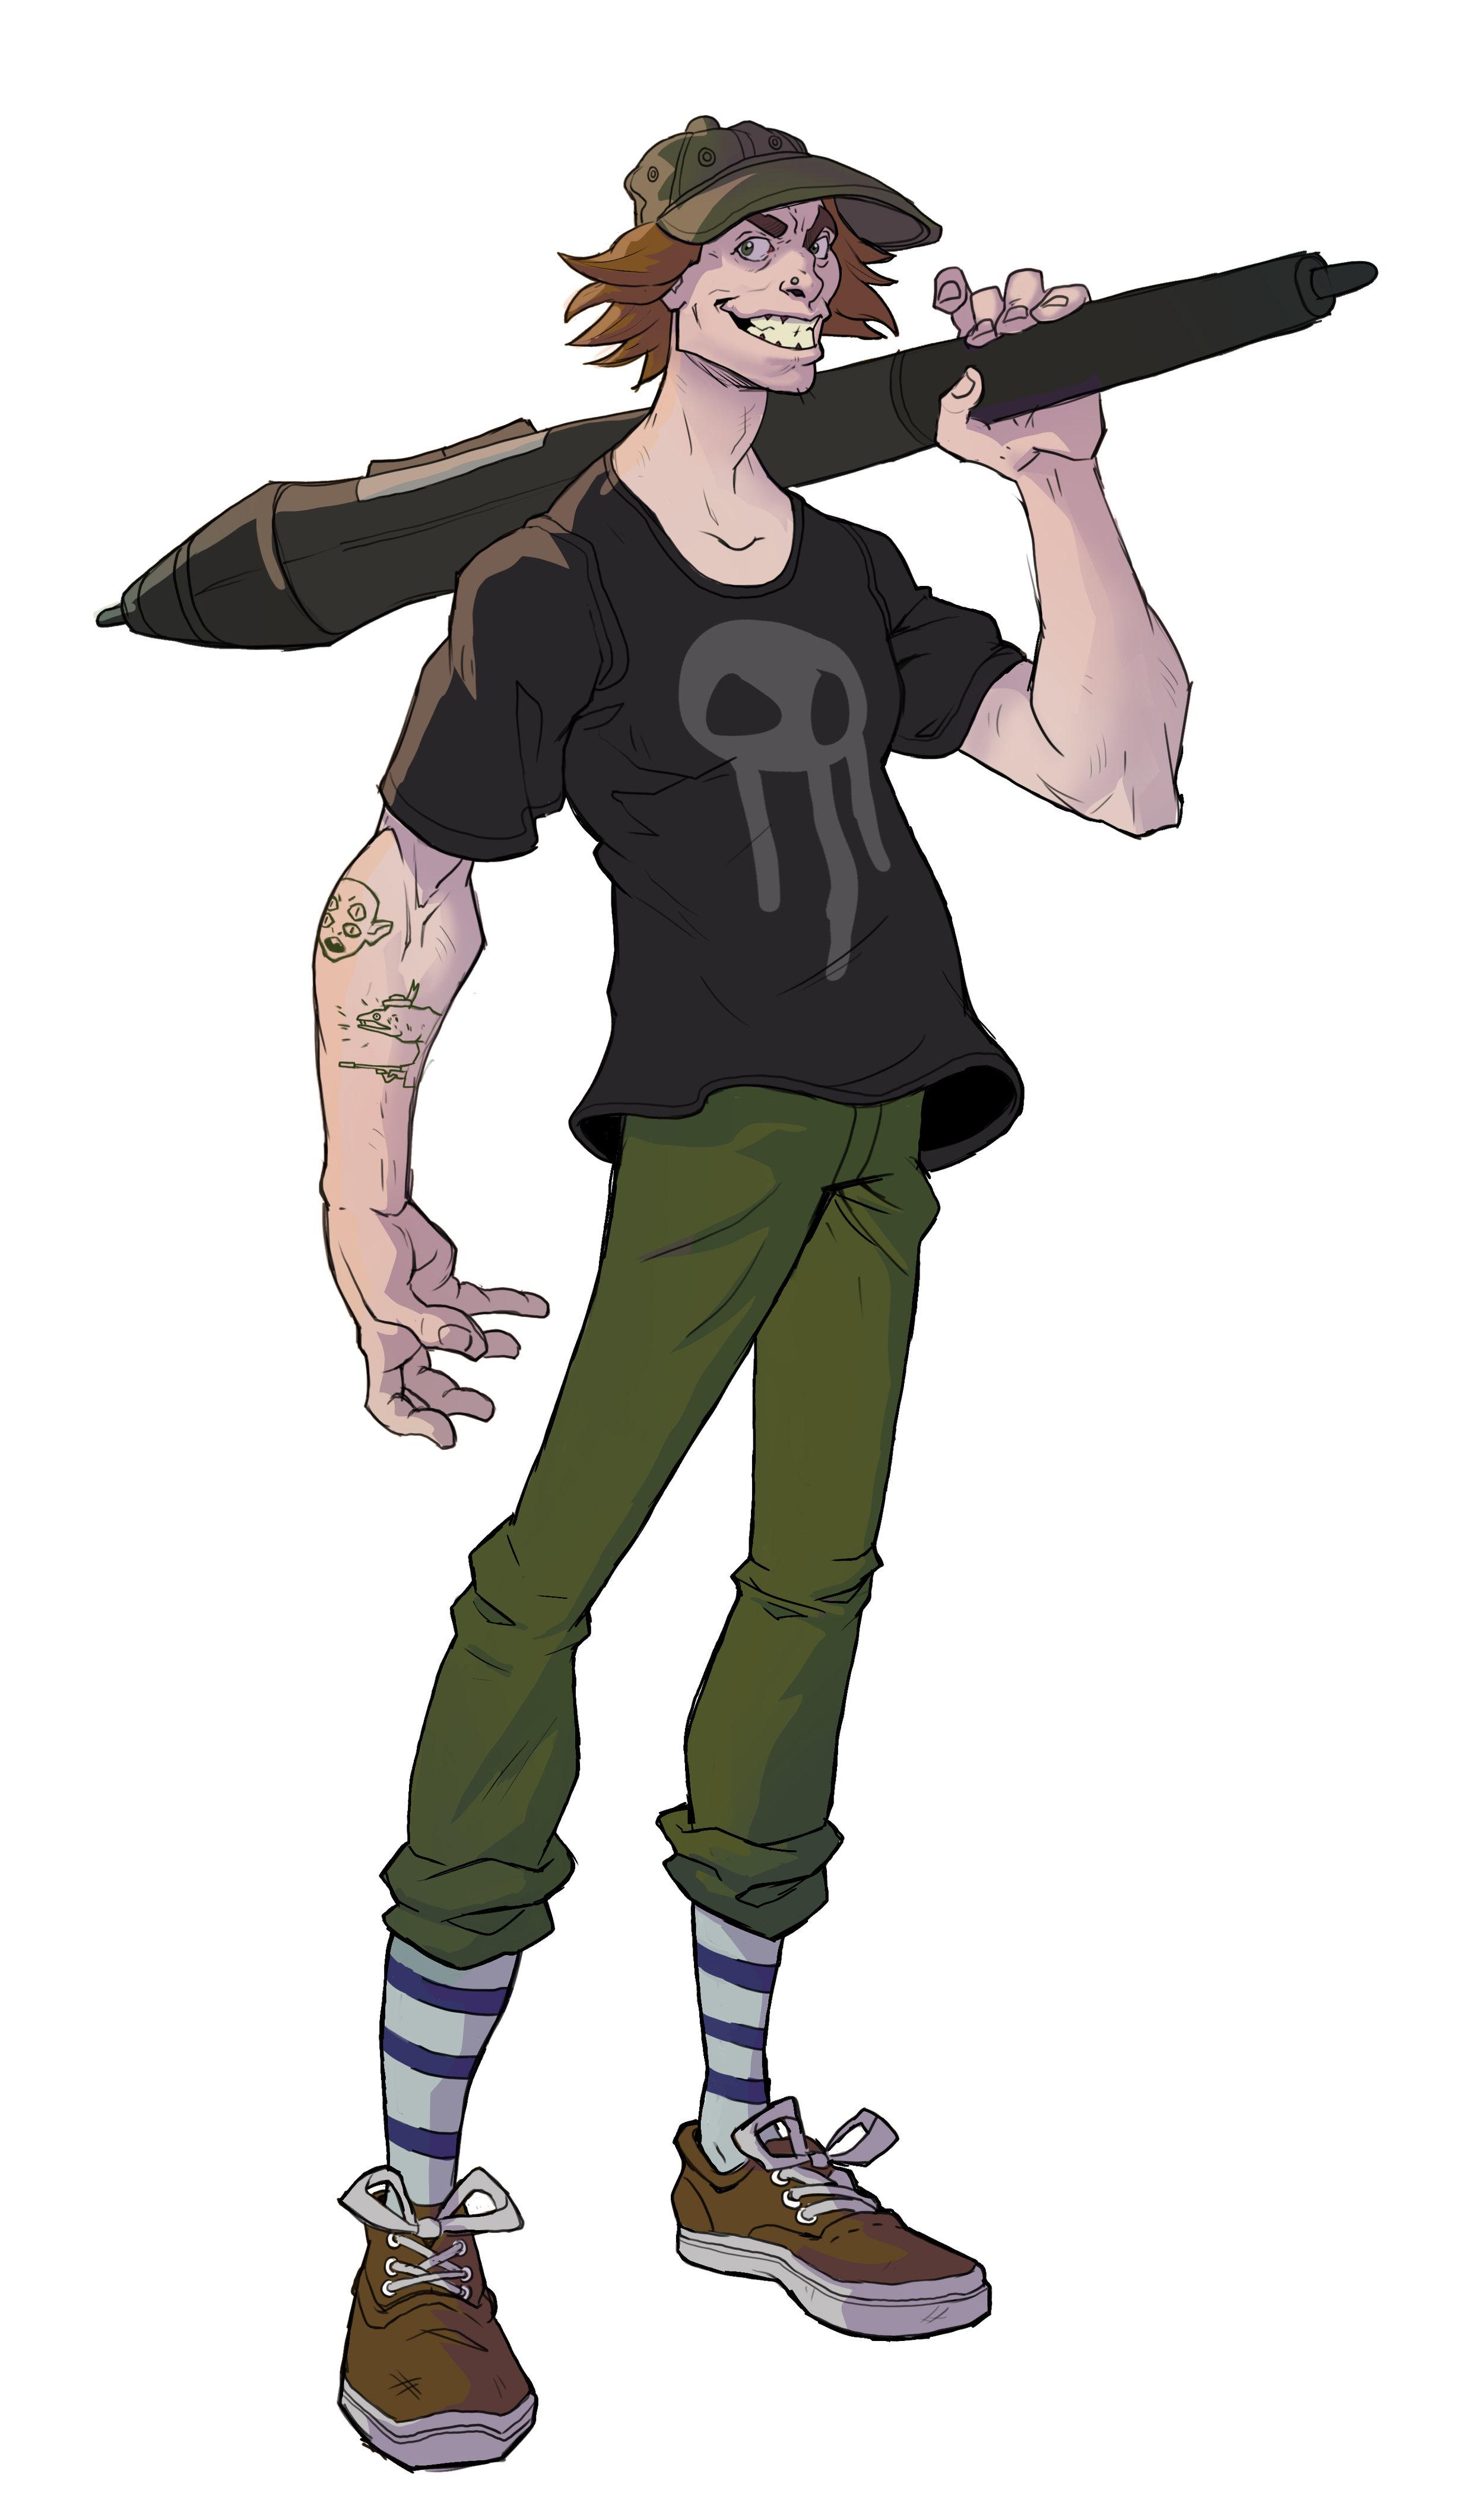 taylor character design.jpg